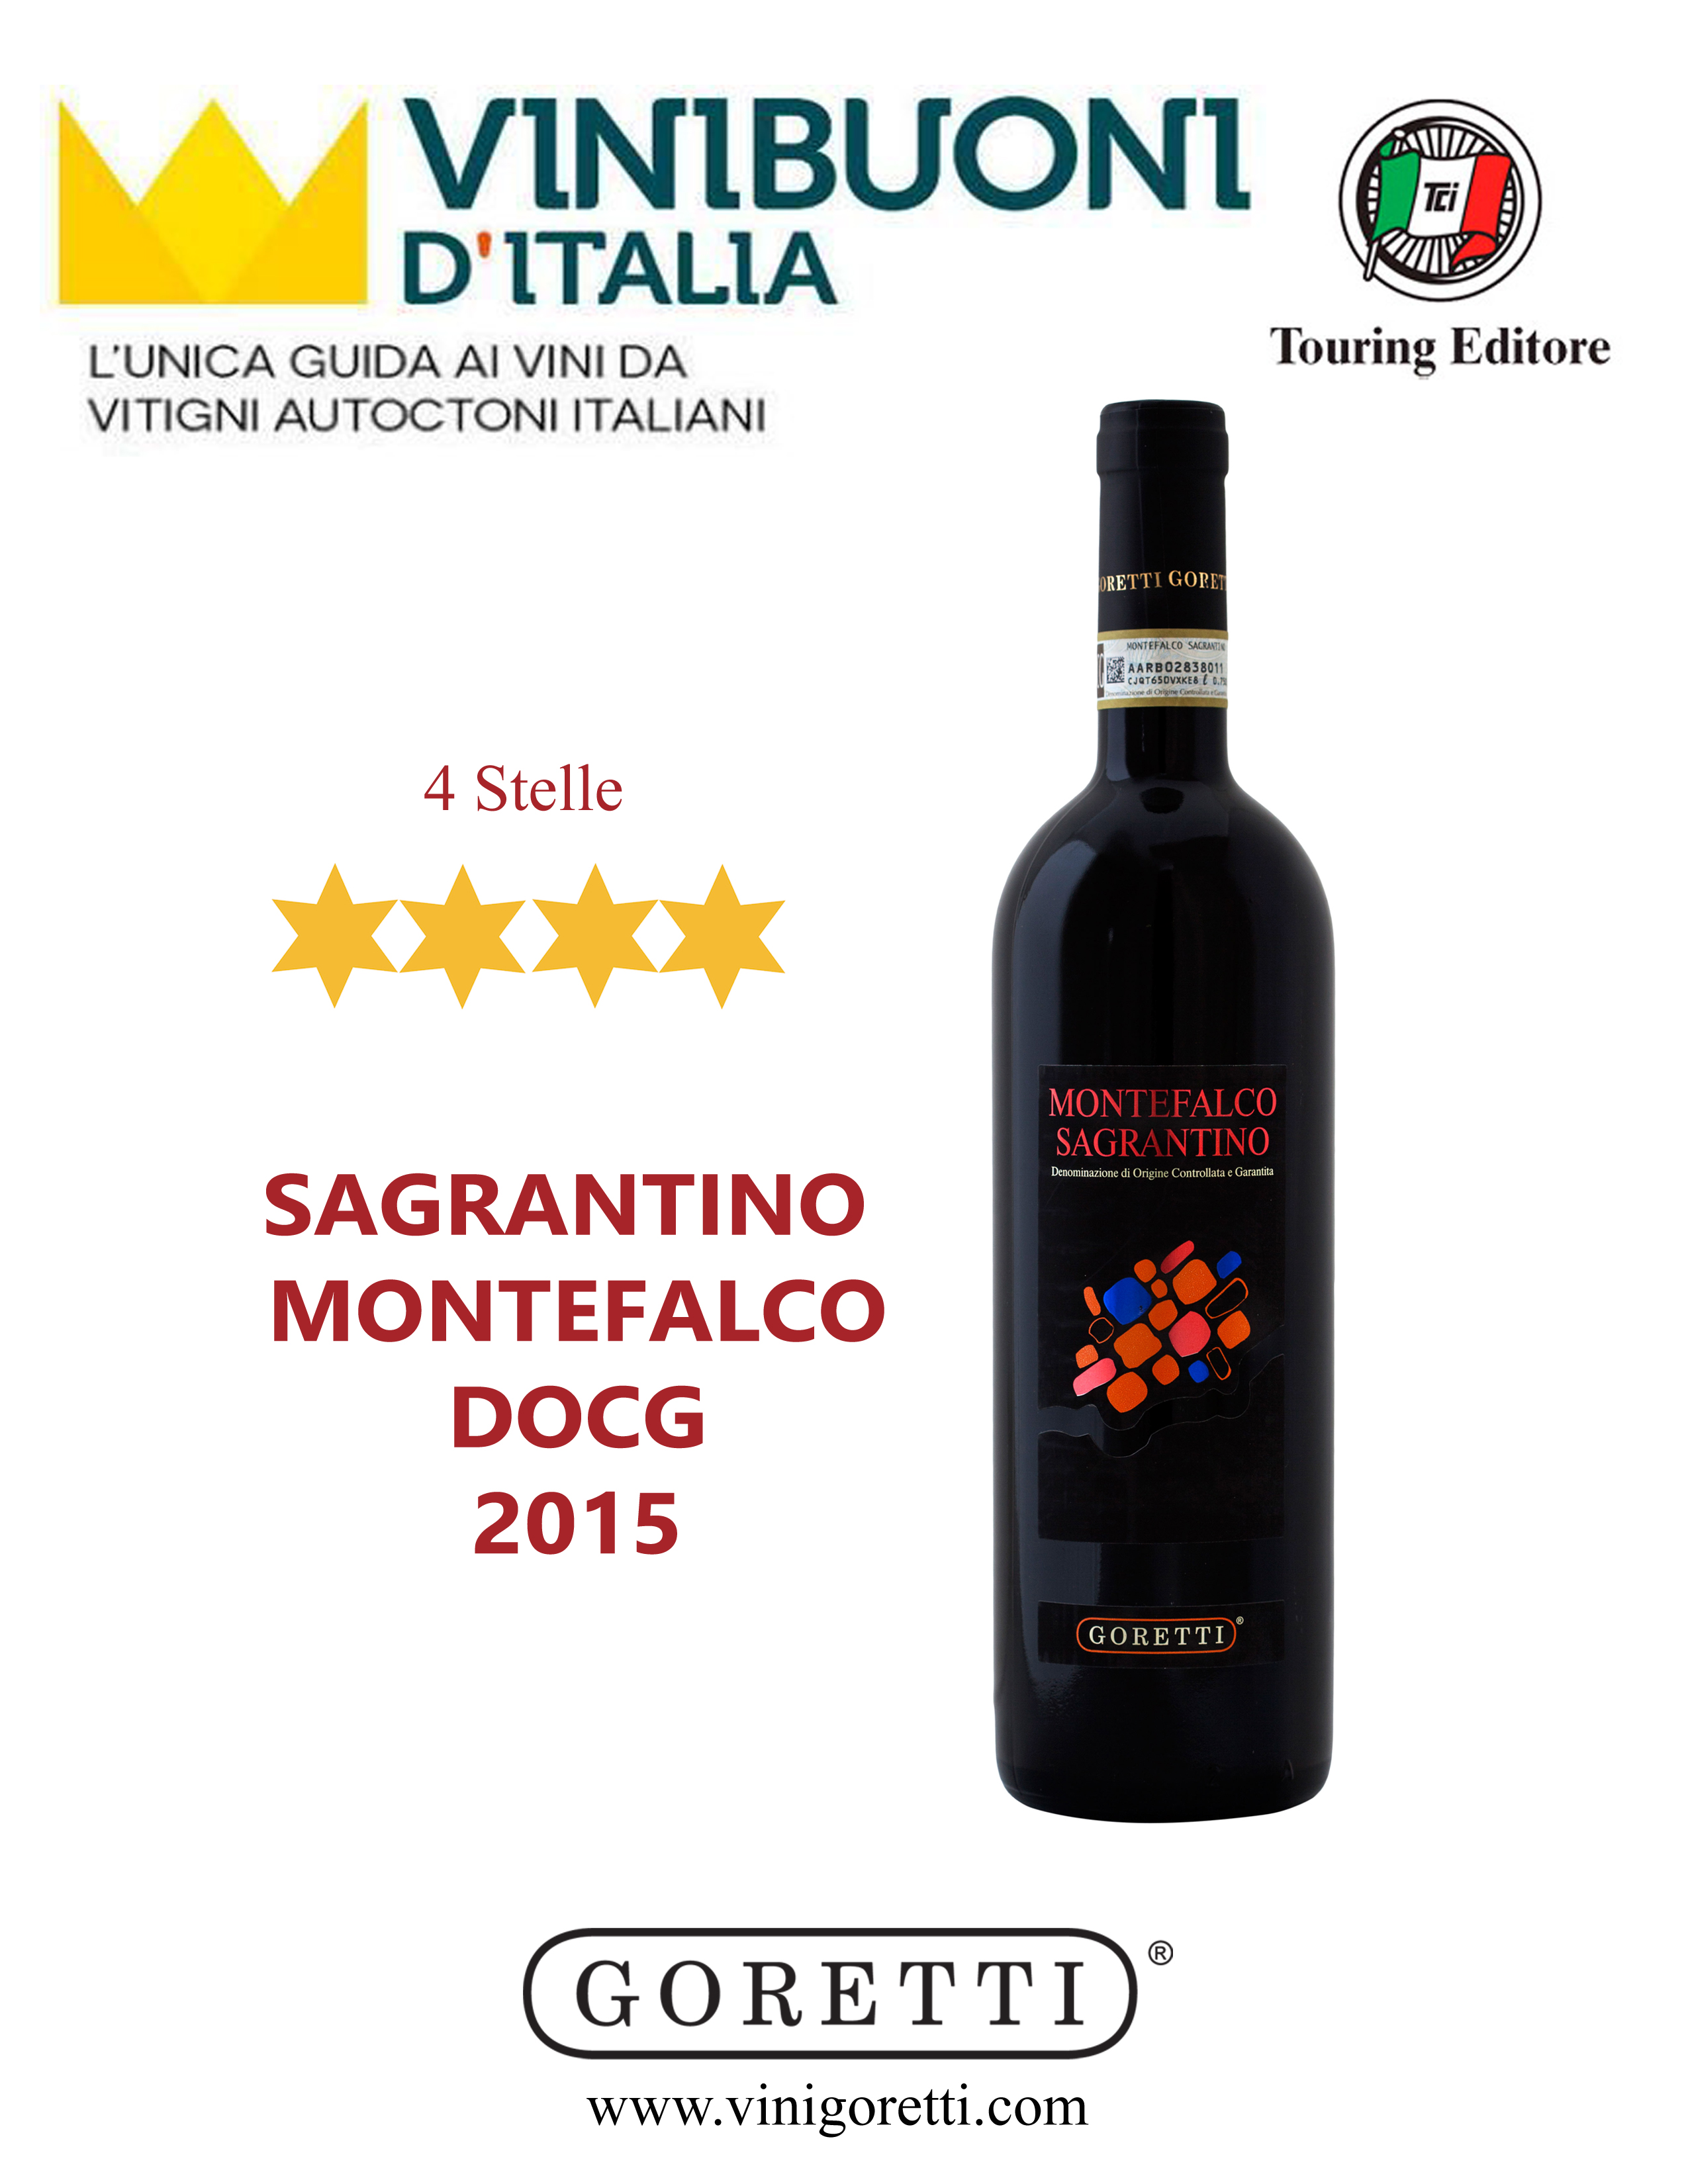 Sagrantino Montefalco DOCG 2015 4 Stelle